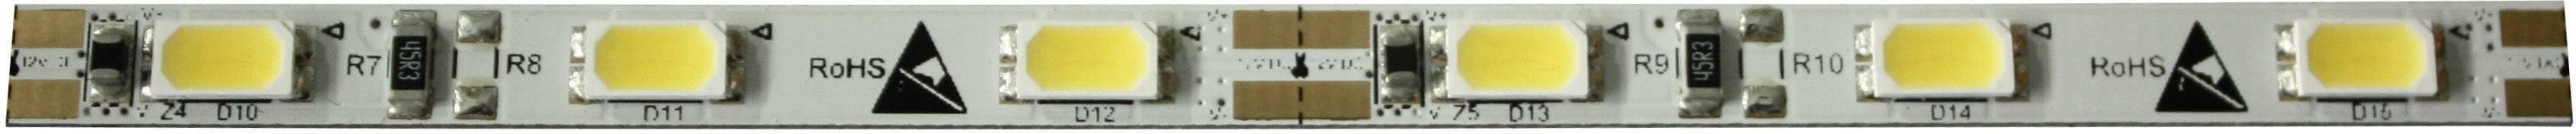 LED pásik Barthelme 50050633 50050633, 12 V, teplá biela, 50 cm